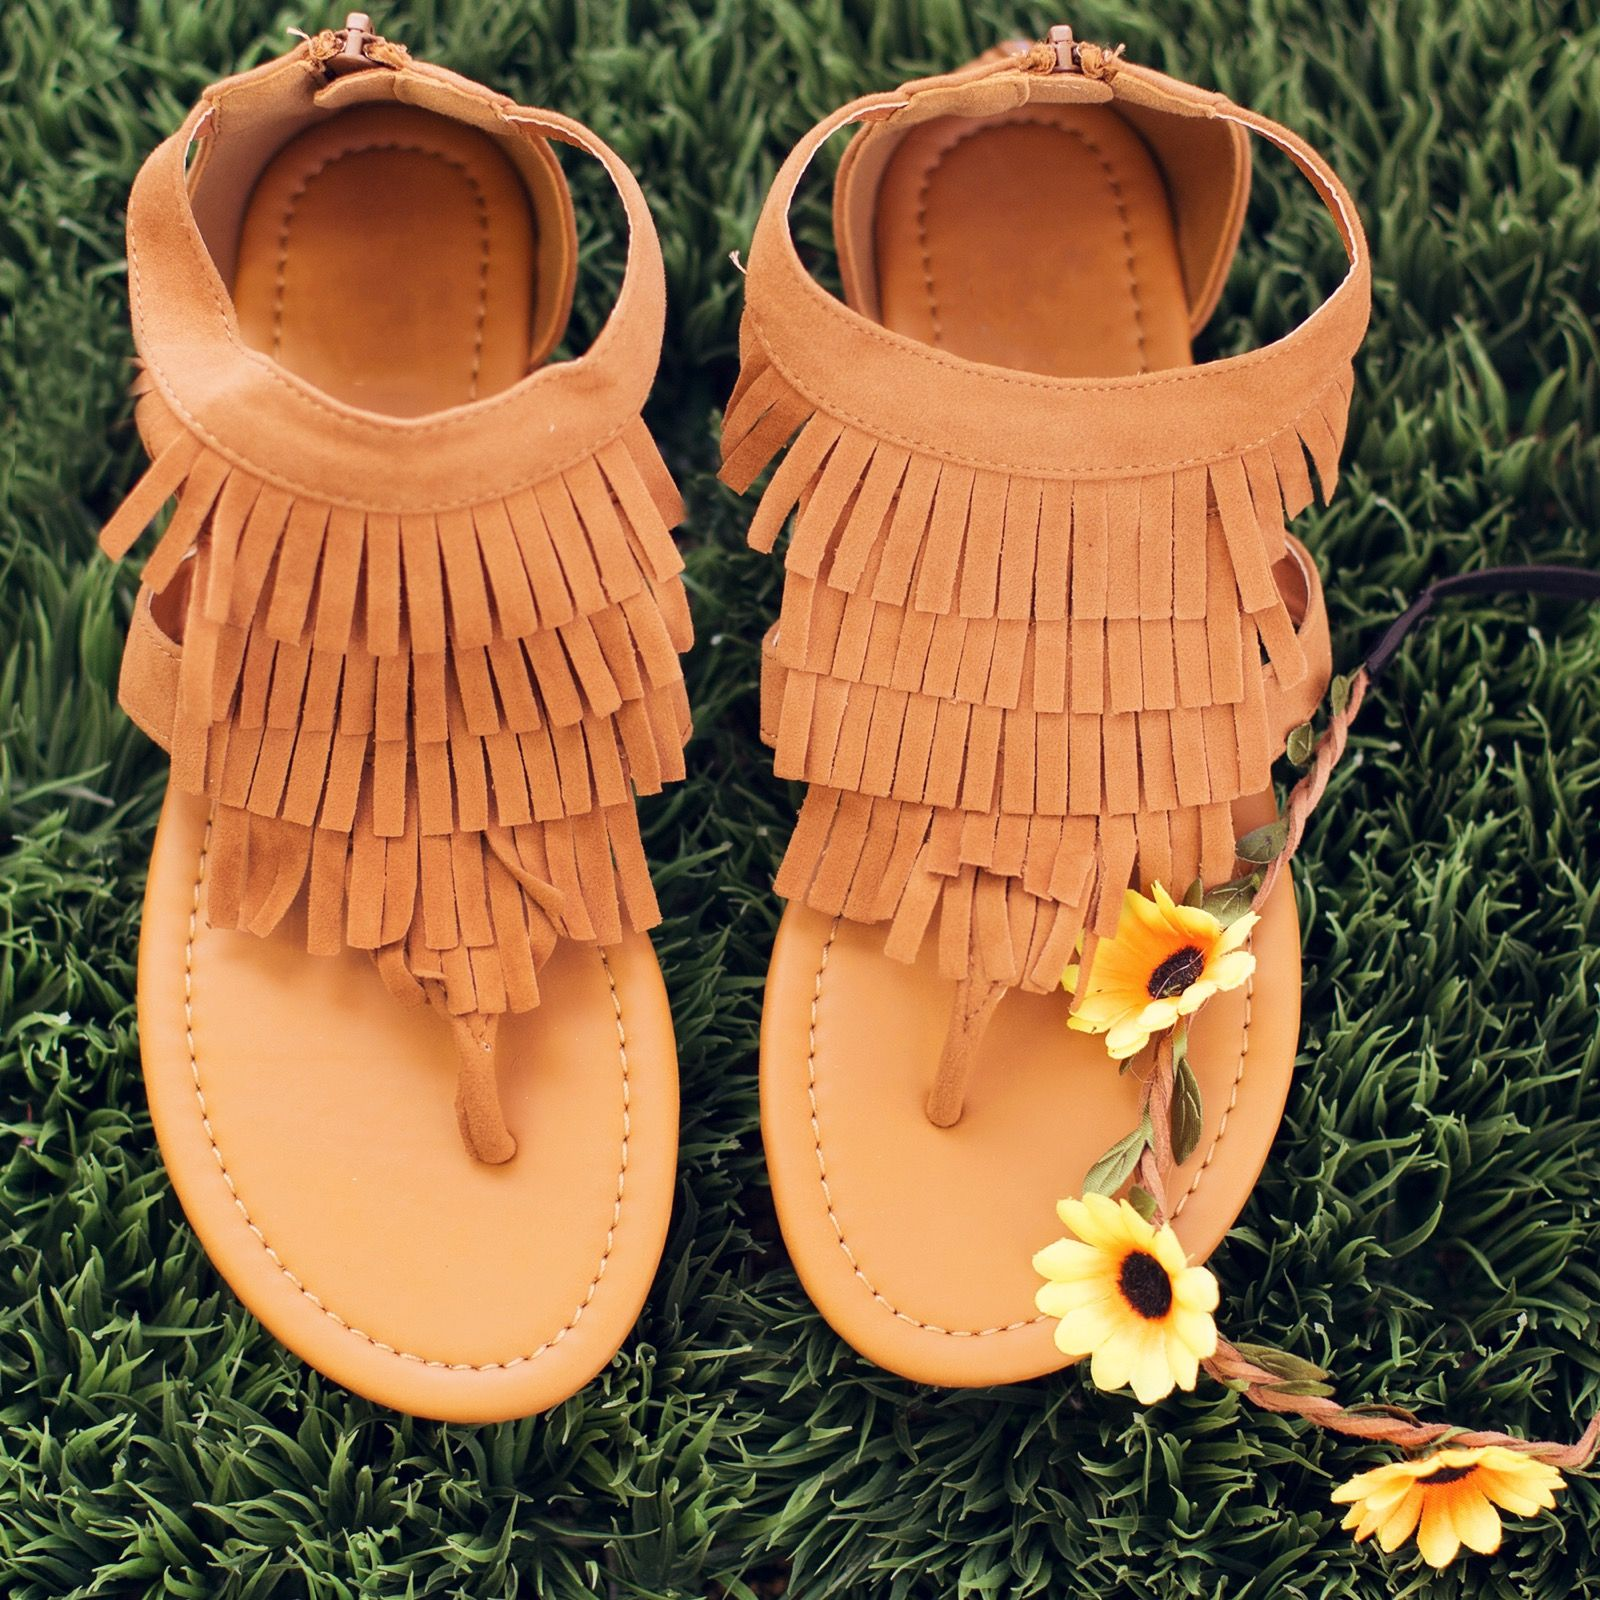 Brisa Fringe Sandals - Tan #Fashion #style #cute #fringe #sandals #trend #boho #Spring #ShopPriceless